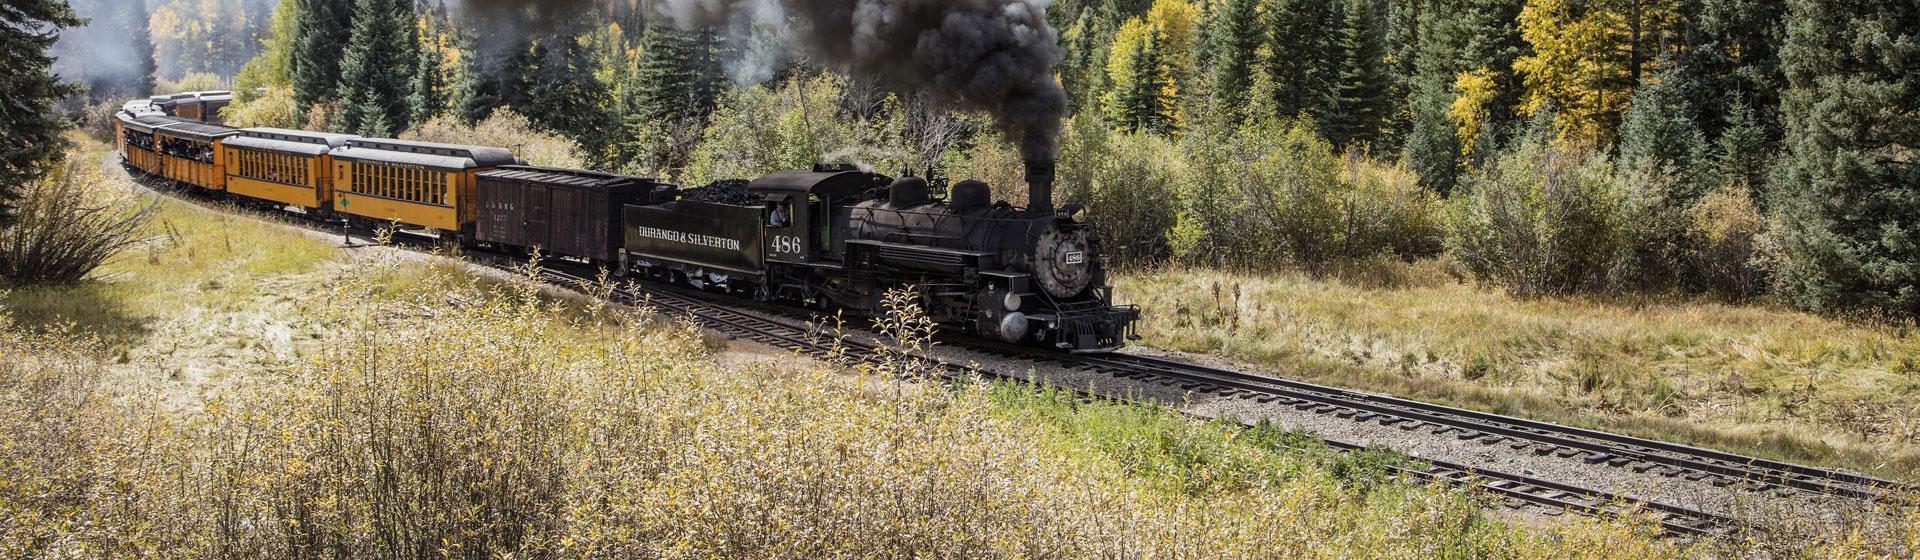 Tåglinje mellan Silverton och Durango i Colorado.